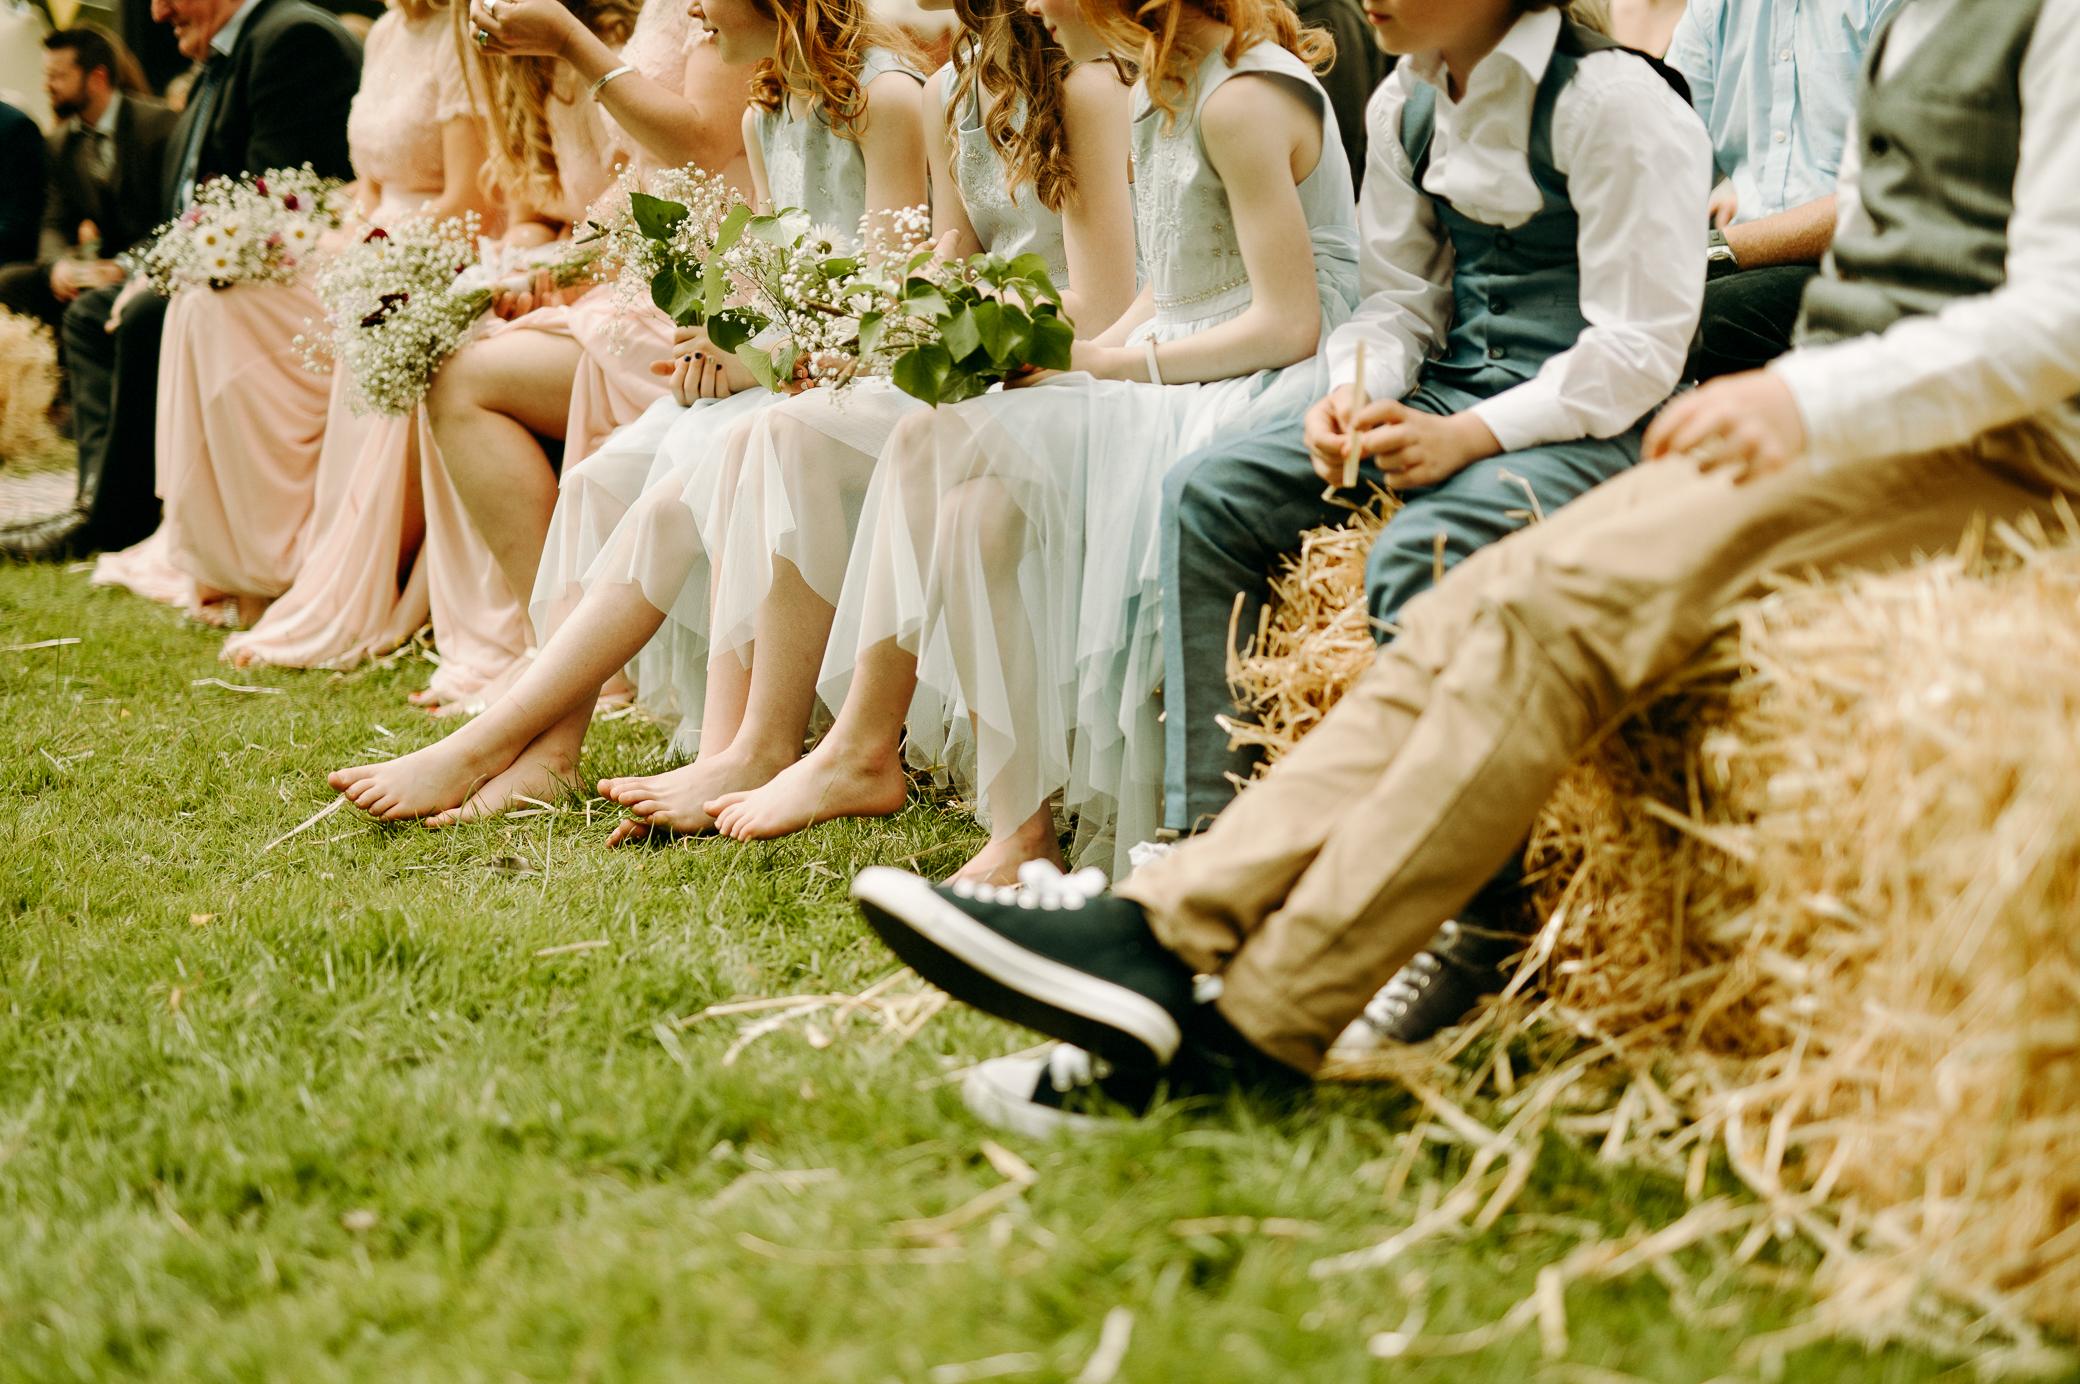 Carmel&Marcus_Wedding photographer Europe-60.jpg